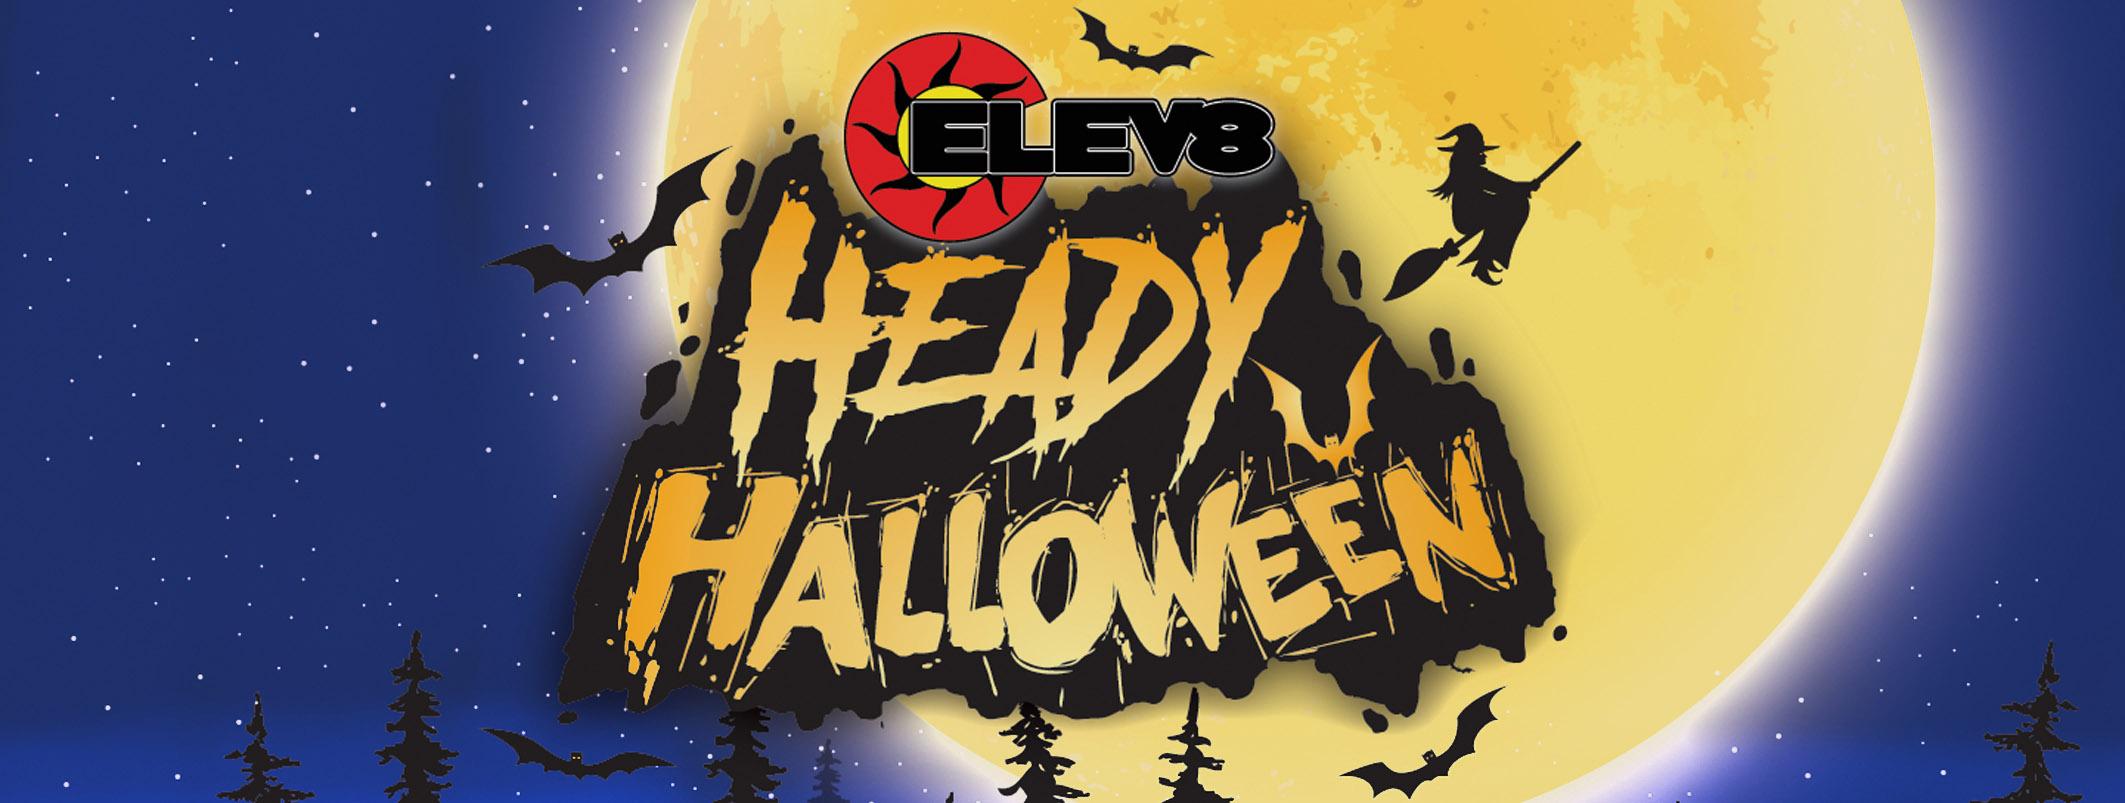 heady-halloween-logo.jpg